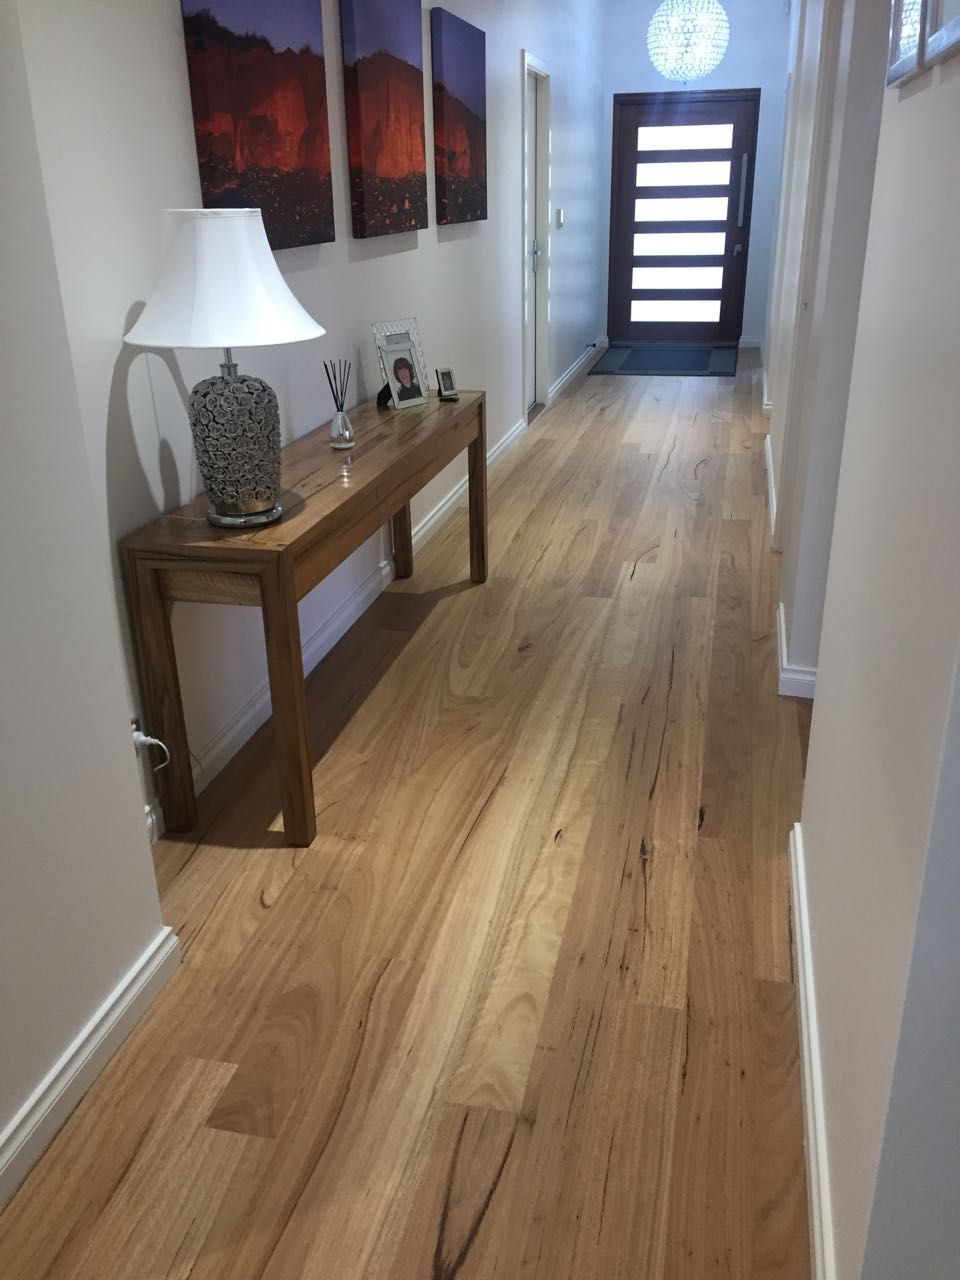 Blackbutt Naturale Finish 2 Of 2 House Flooring Timber Flooring Engineered Wood Floors